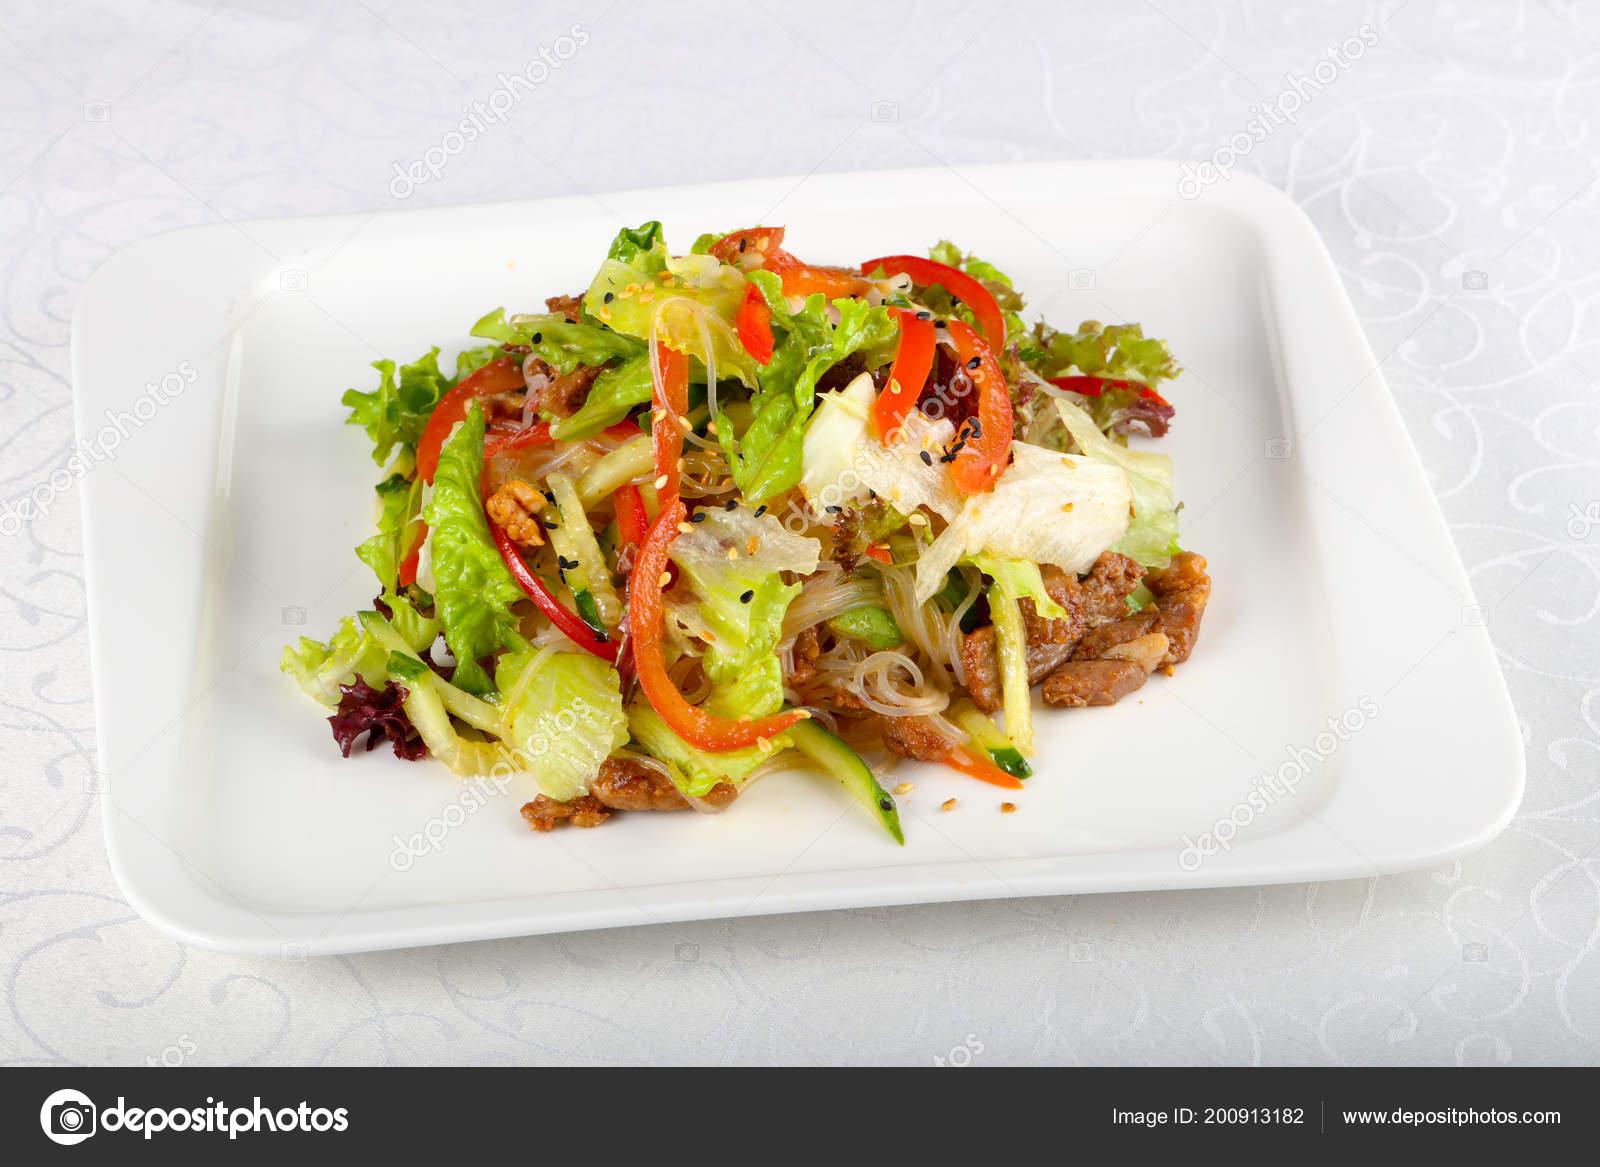 Салат из лапши со свининой рекомендации